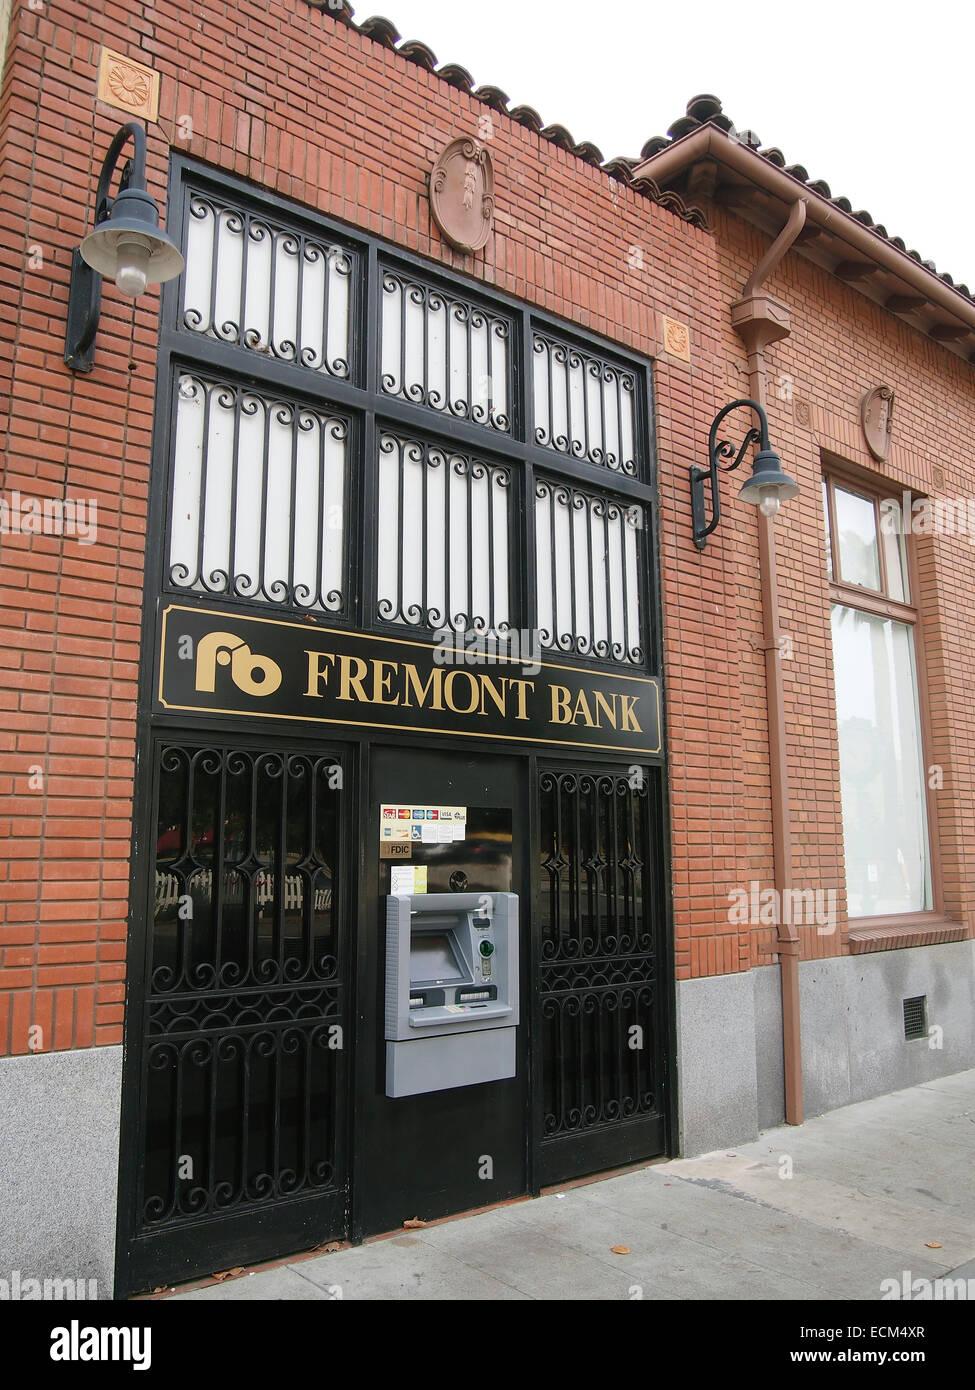 Fremont Bank Building, Fremont, California - Stock Image